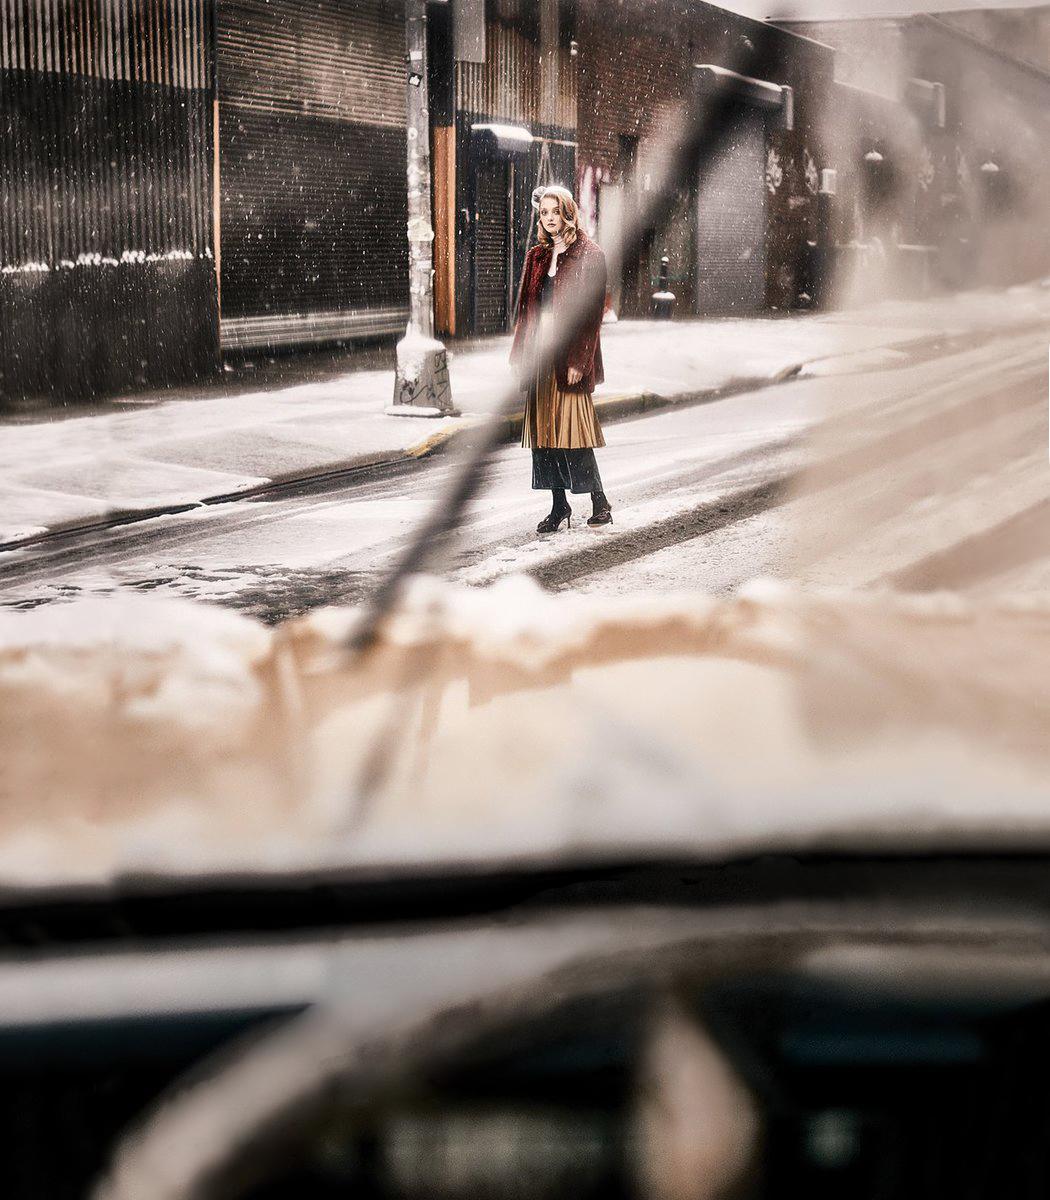 пальто, Dolce&Gabbana; водолазка, Victoria Hayes; платье, Free People; юбка, Smallable; туфли, Kate Spade; шляпа из меха норки, Yves Salomon; брошь, собственность стилиста; колготки, Wolford